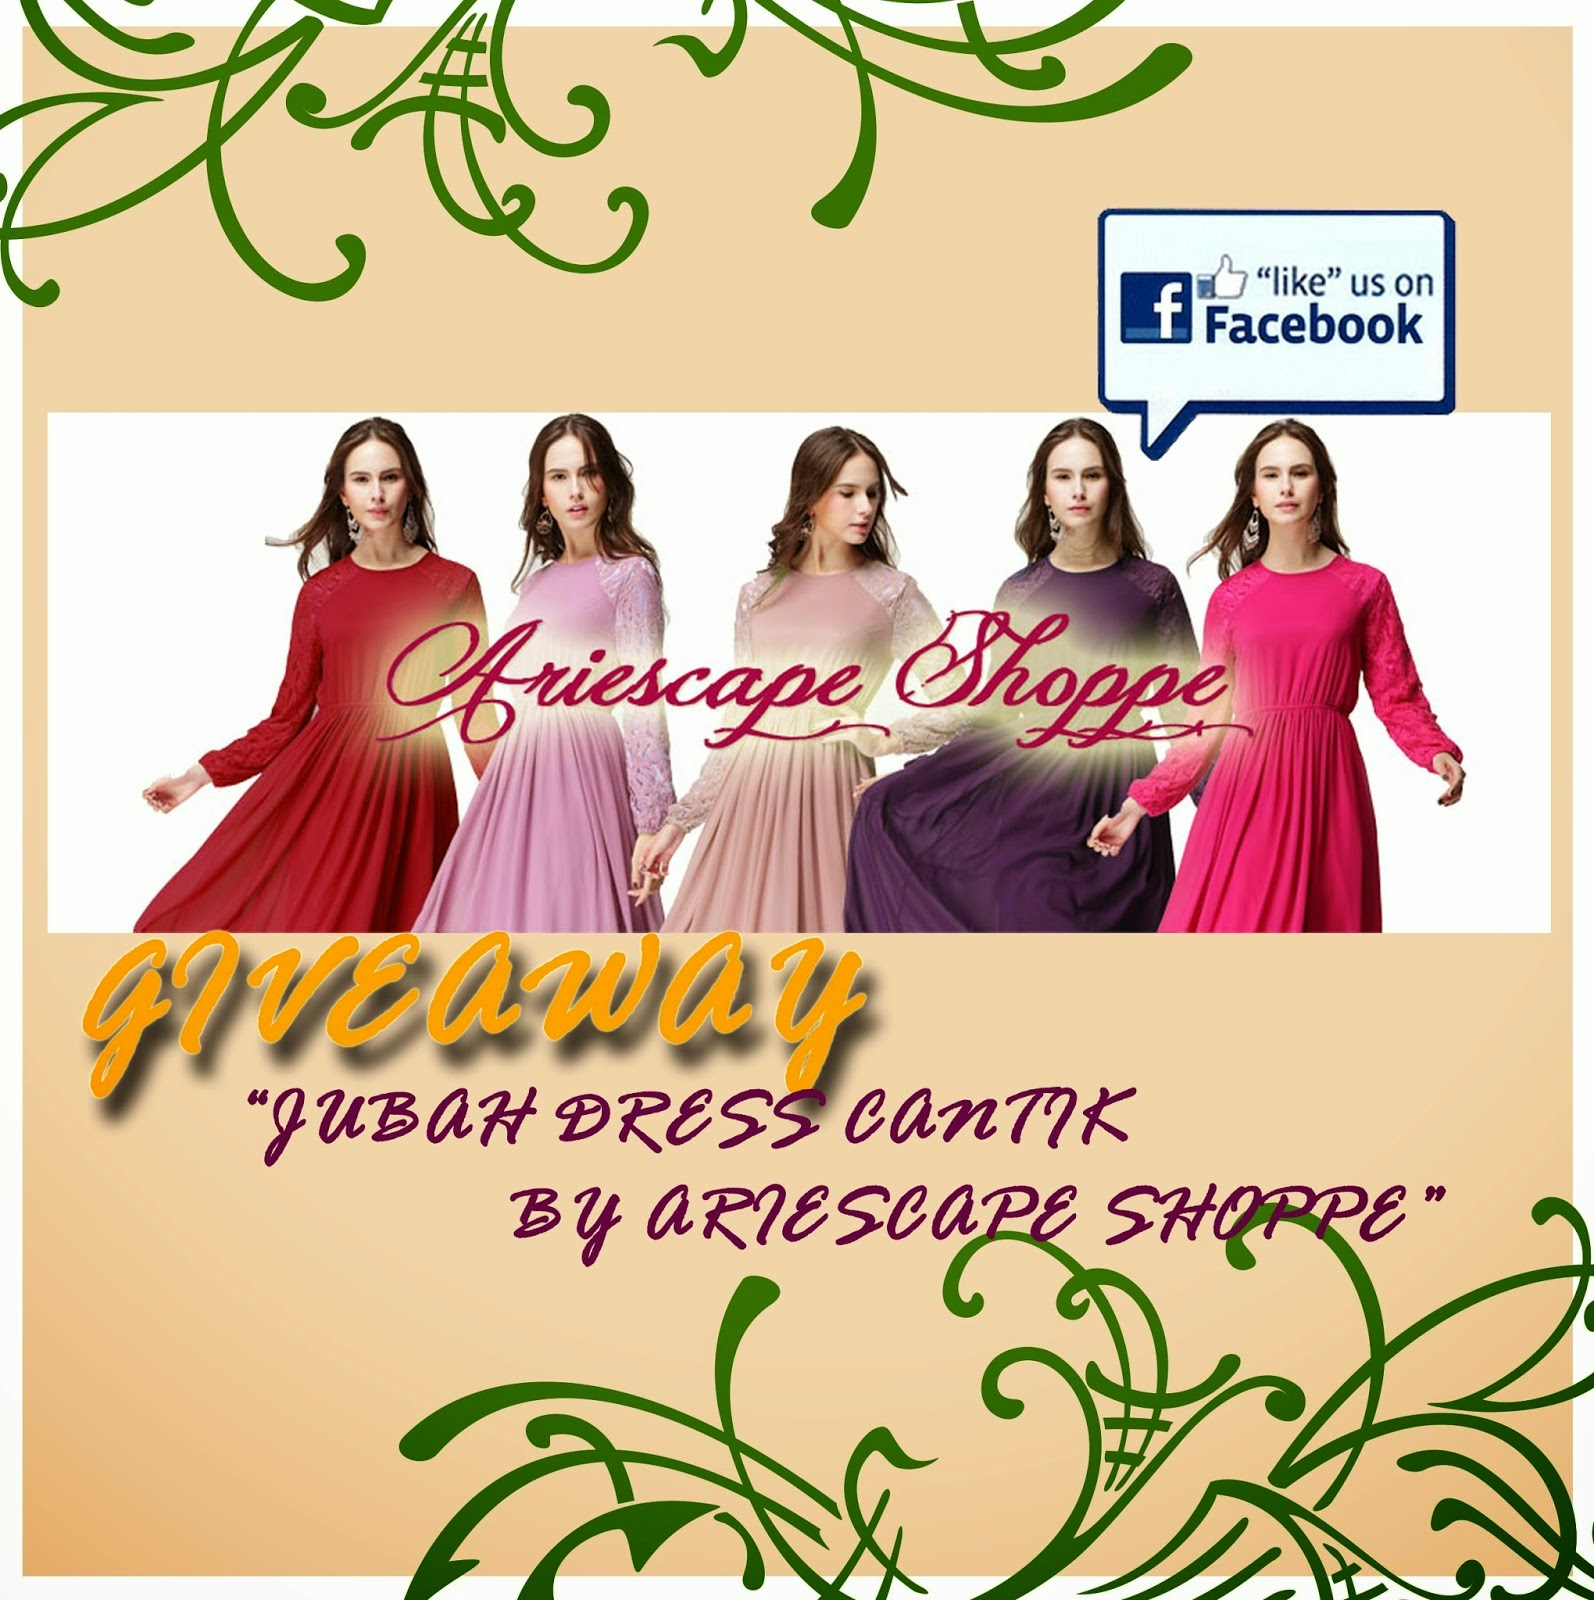 http://ariescape.blogspot.com/2014/08/giveaway-jubah-dress-cantik-by.html